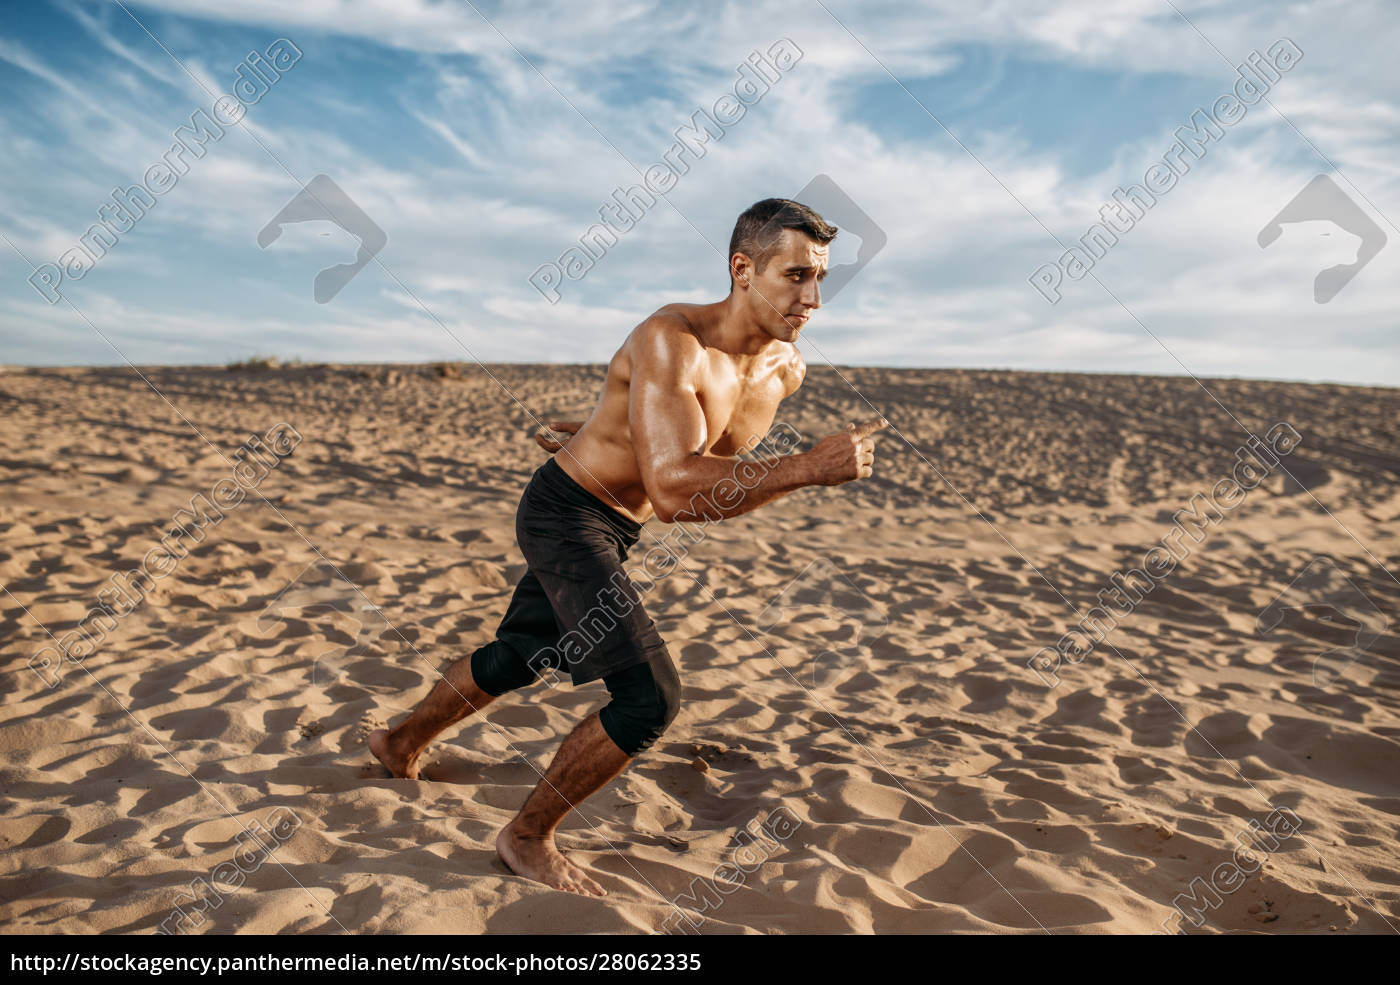 athlete, on, running, workout, in, desert - 28062335